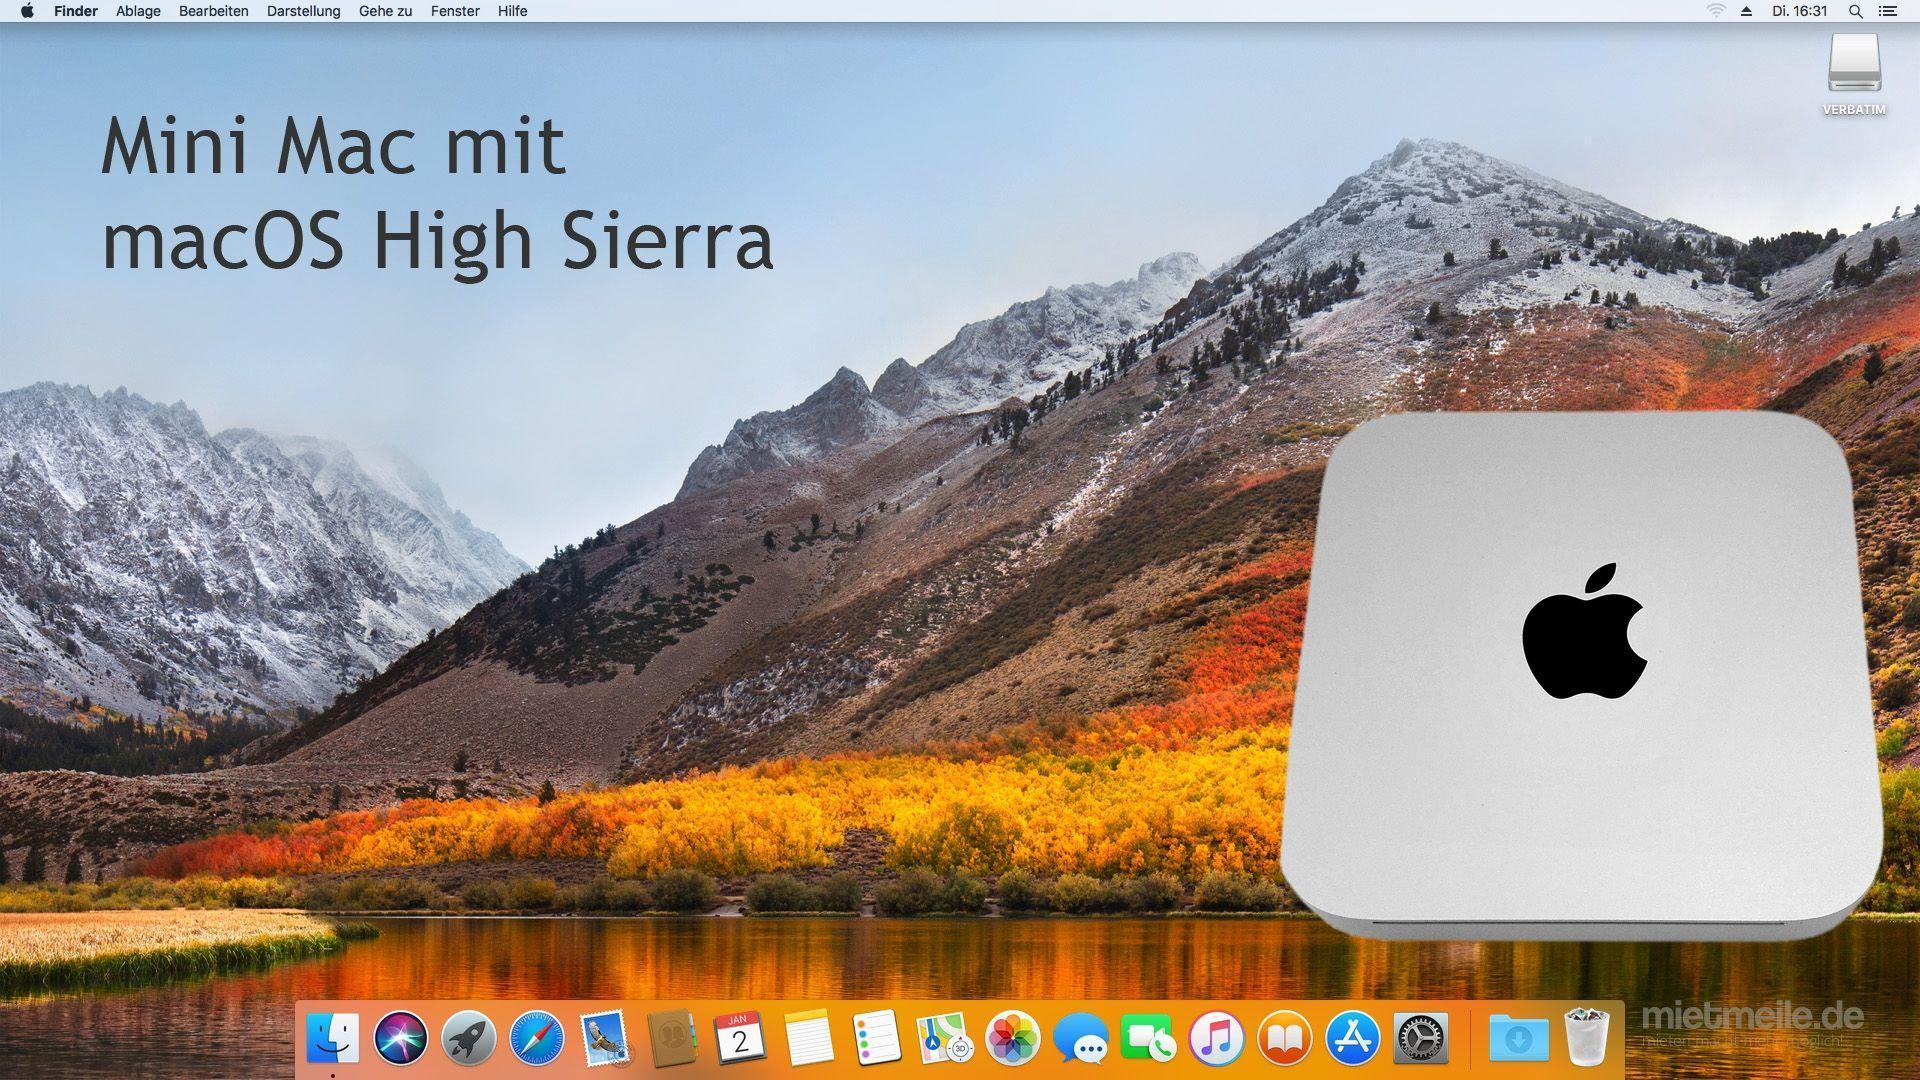 Apple mieten & vermieten - Mac Mini unibody Apple macOS High Sierra minimac macmini - Berlin Hamburg Köln Stuttgart München Leipzig Saarbrücken Duisburg Hannover Bremen Frankfurt in Berlin